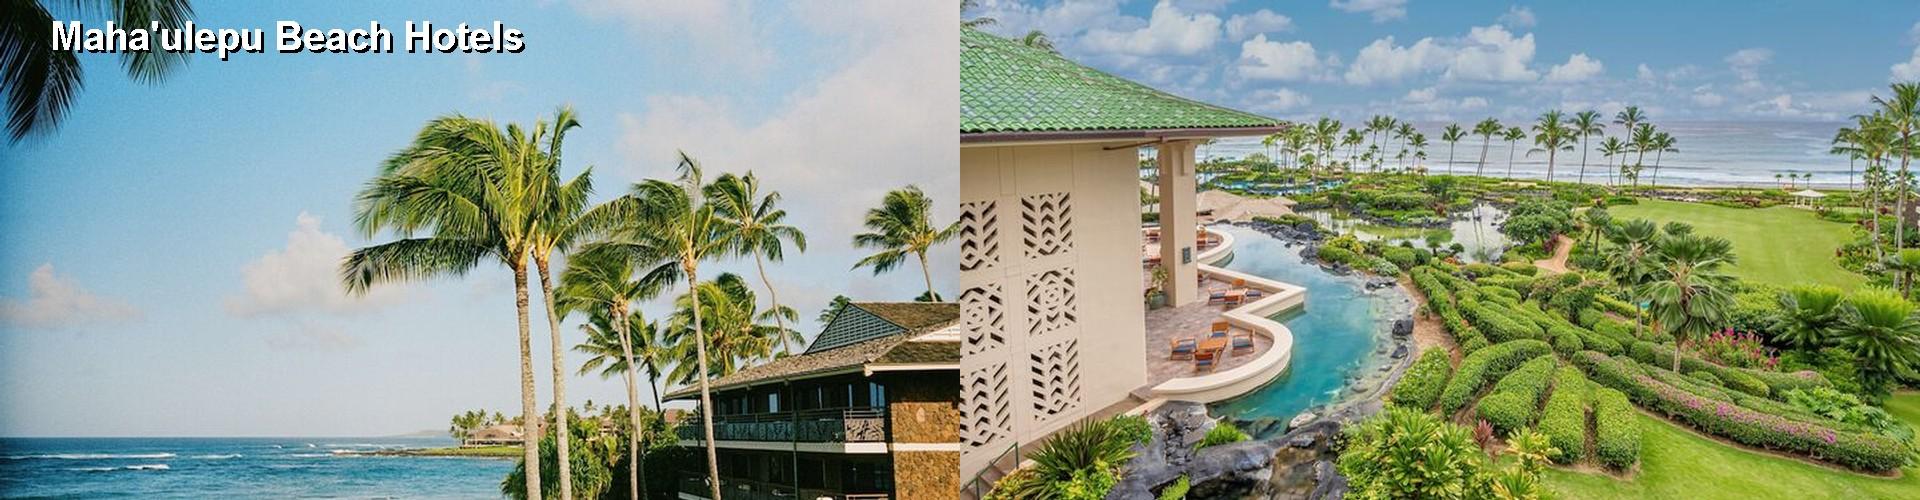 5 Best Hotels Near Maha Ulepu Beach